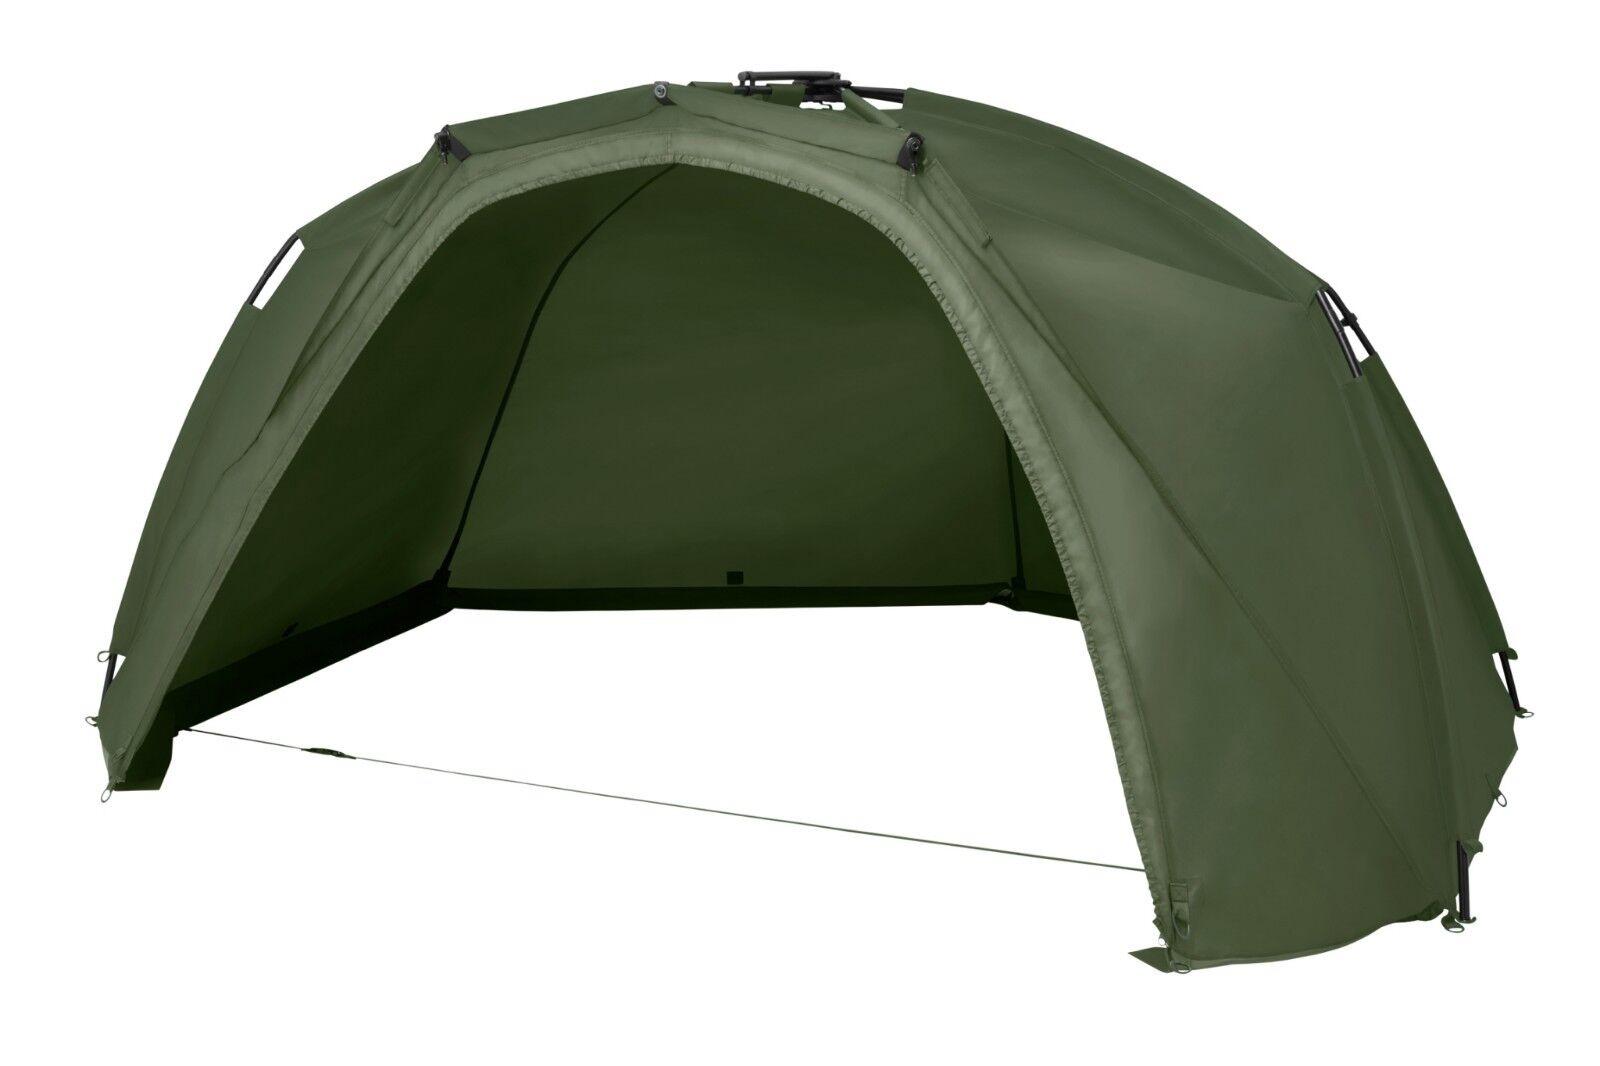 Trakker Tempest Brolly V2 NEW Lightweight Compact Fishing 202250 Shelter 202250 Fishing 11e393